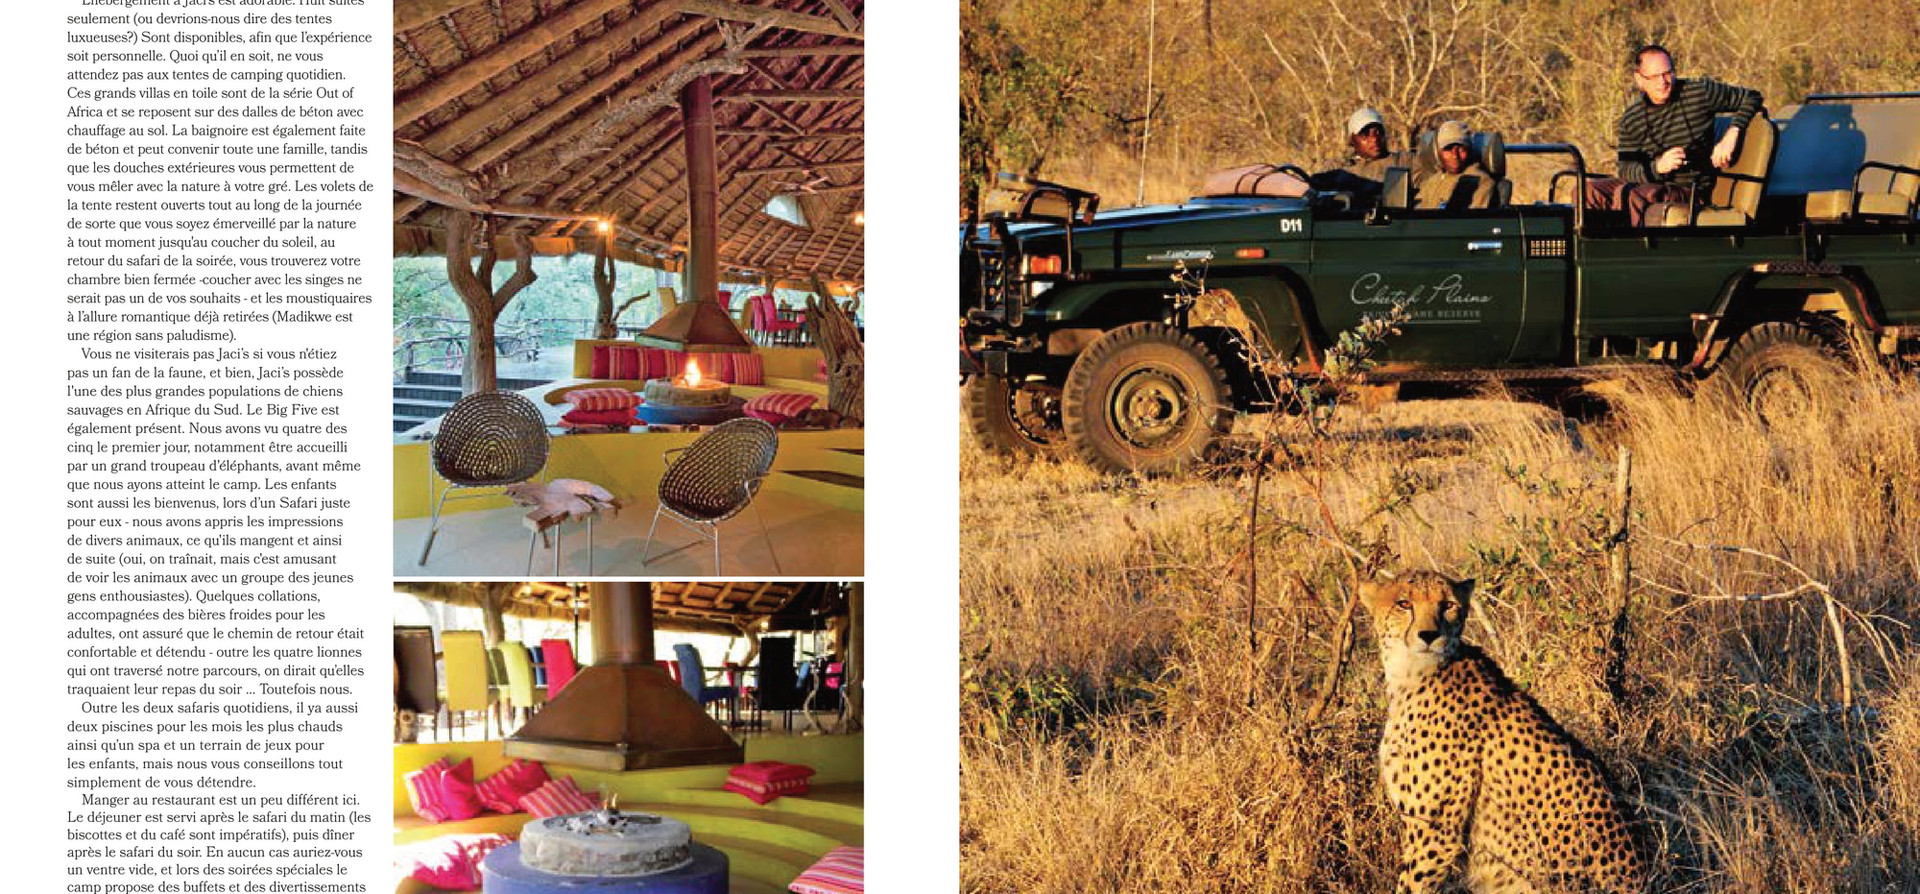 Indwe - Madikwe pg 2 - December 2012-5.j